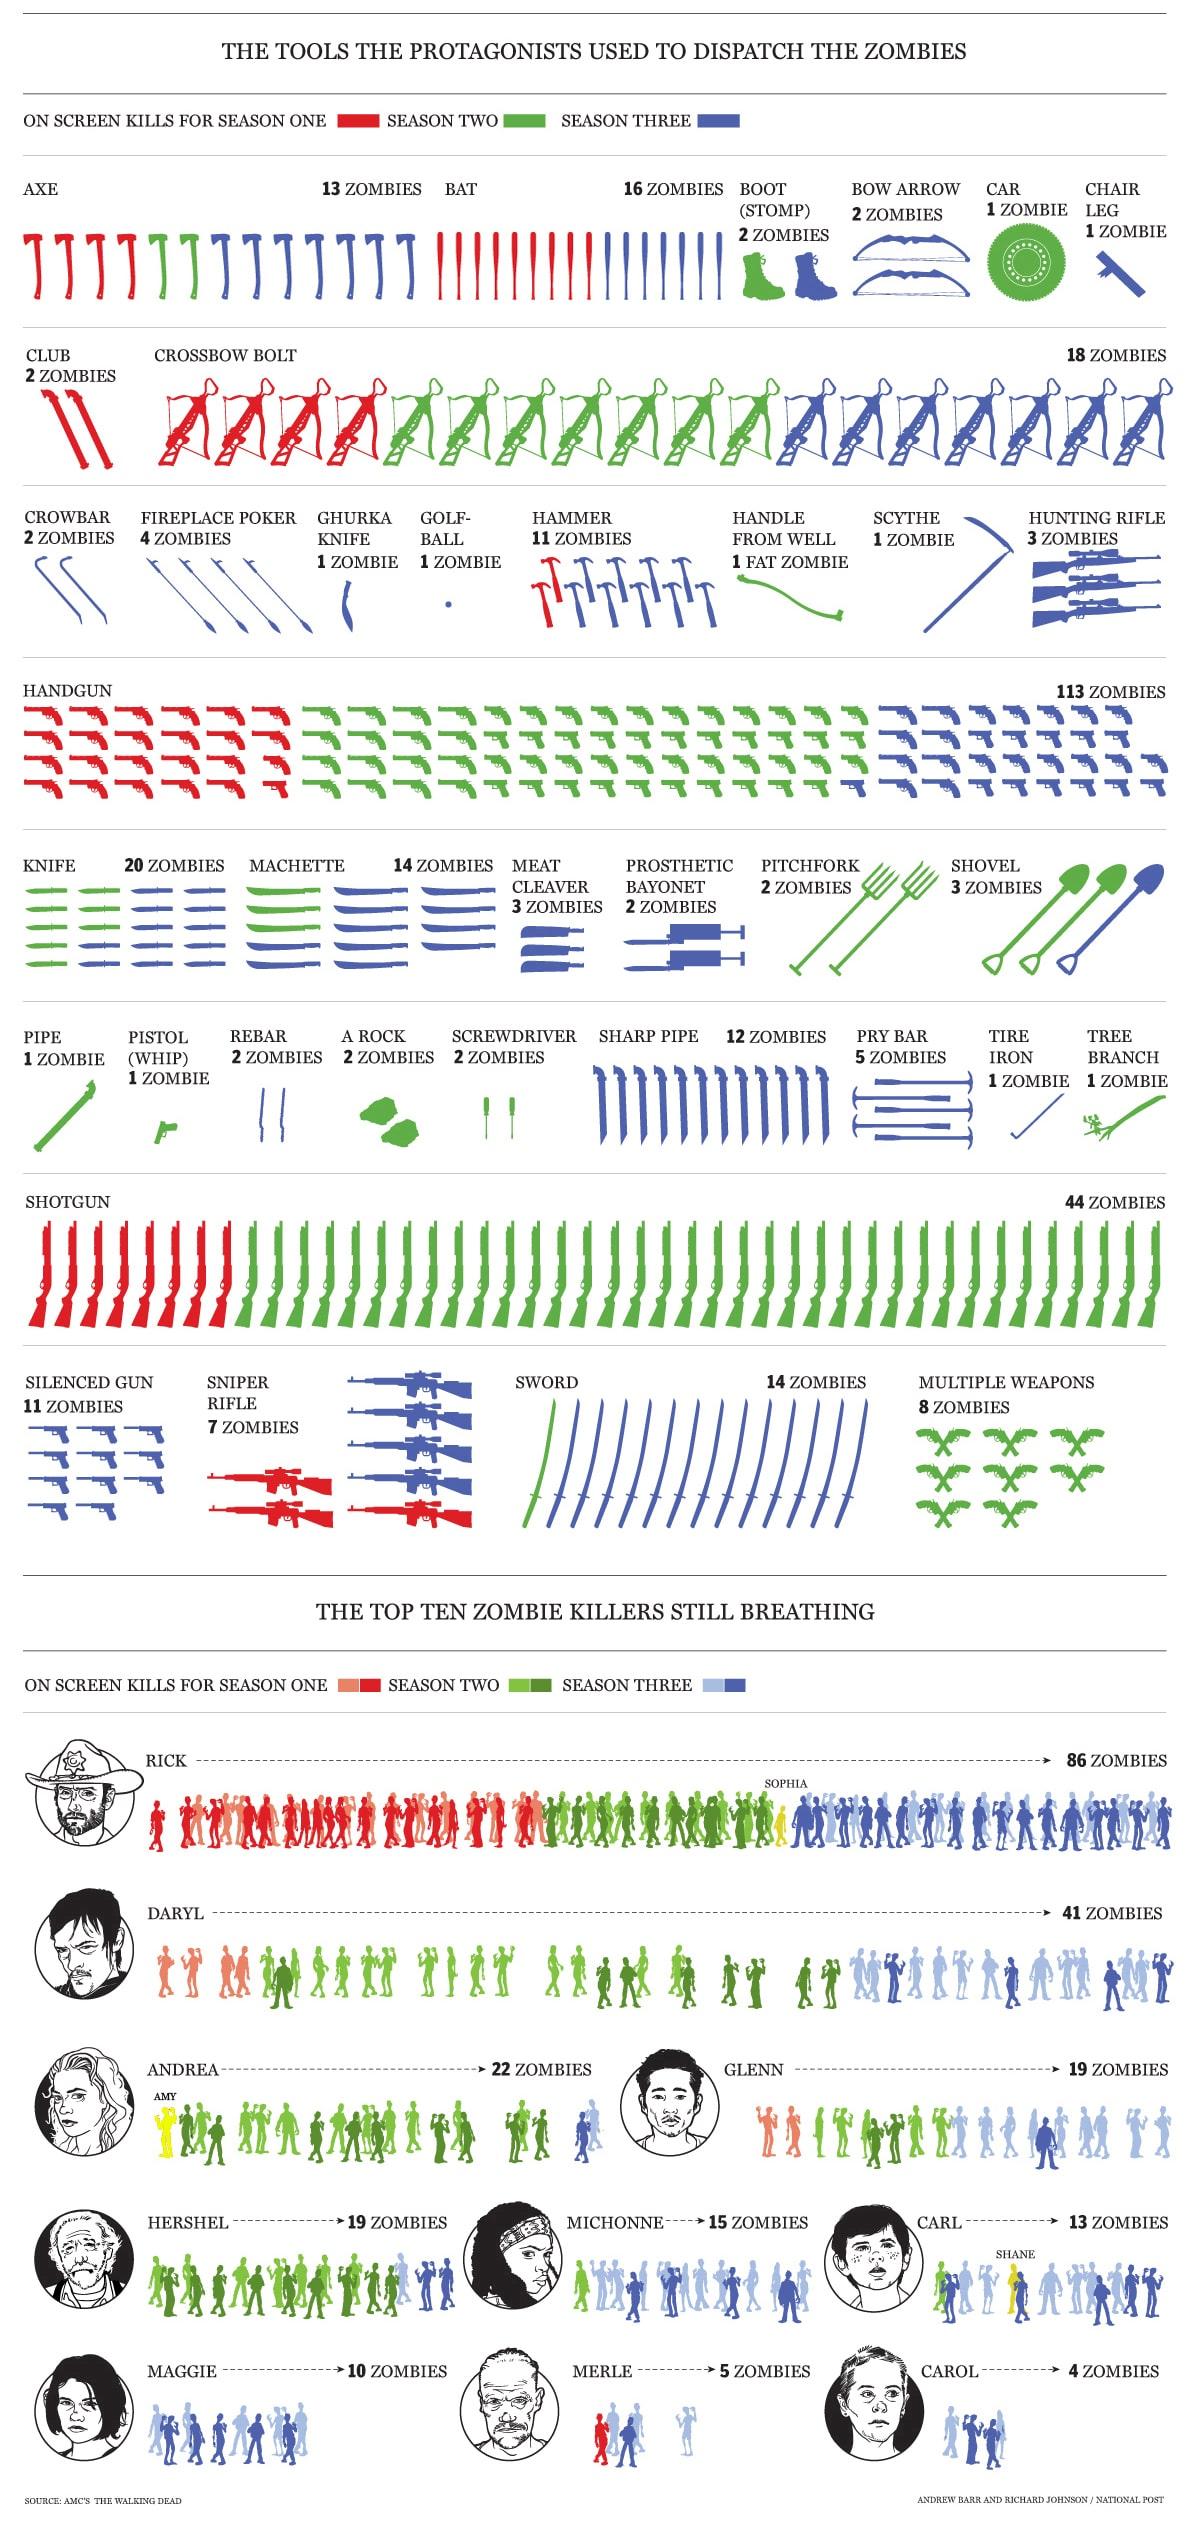 every-zombie-killed-chart